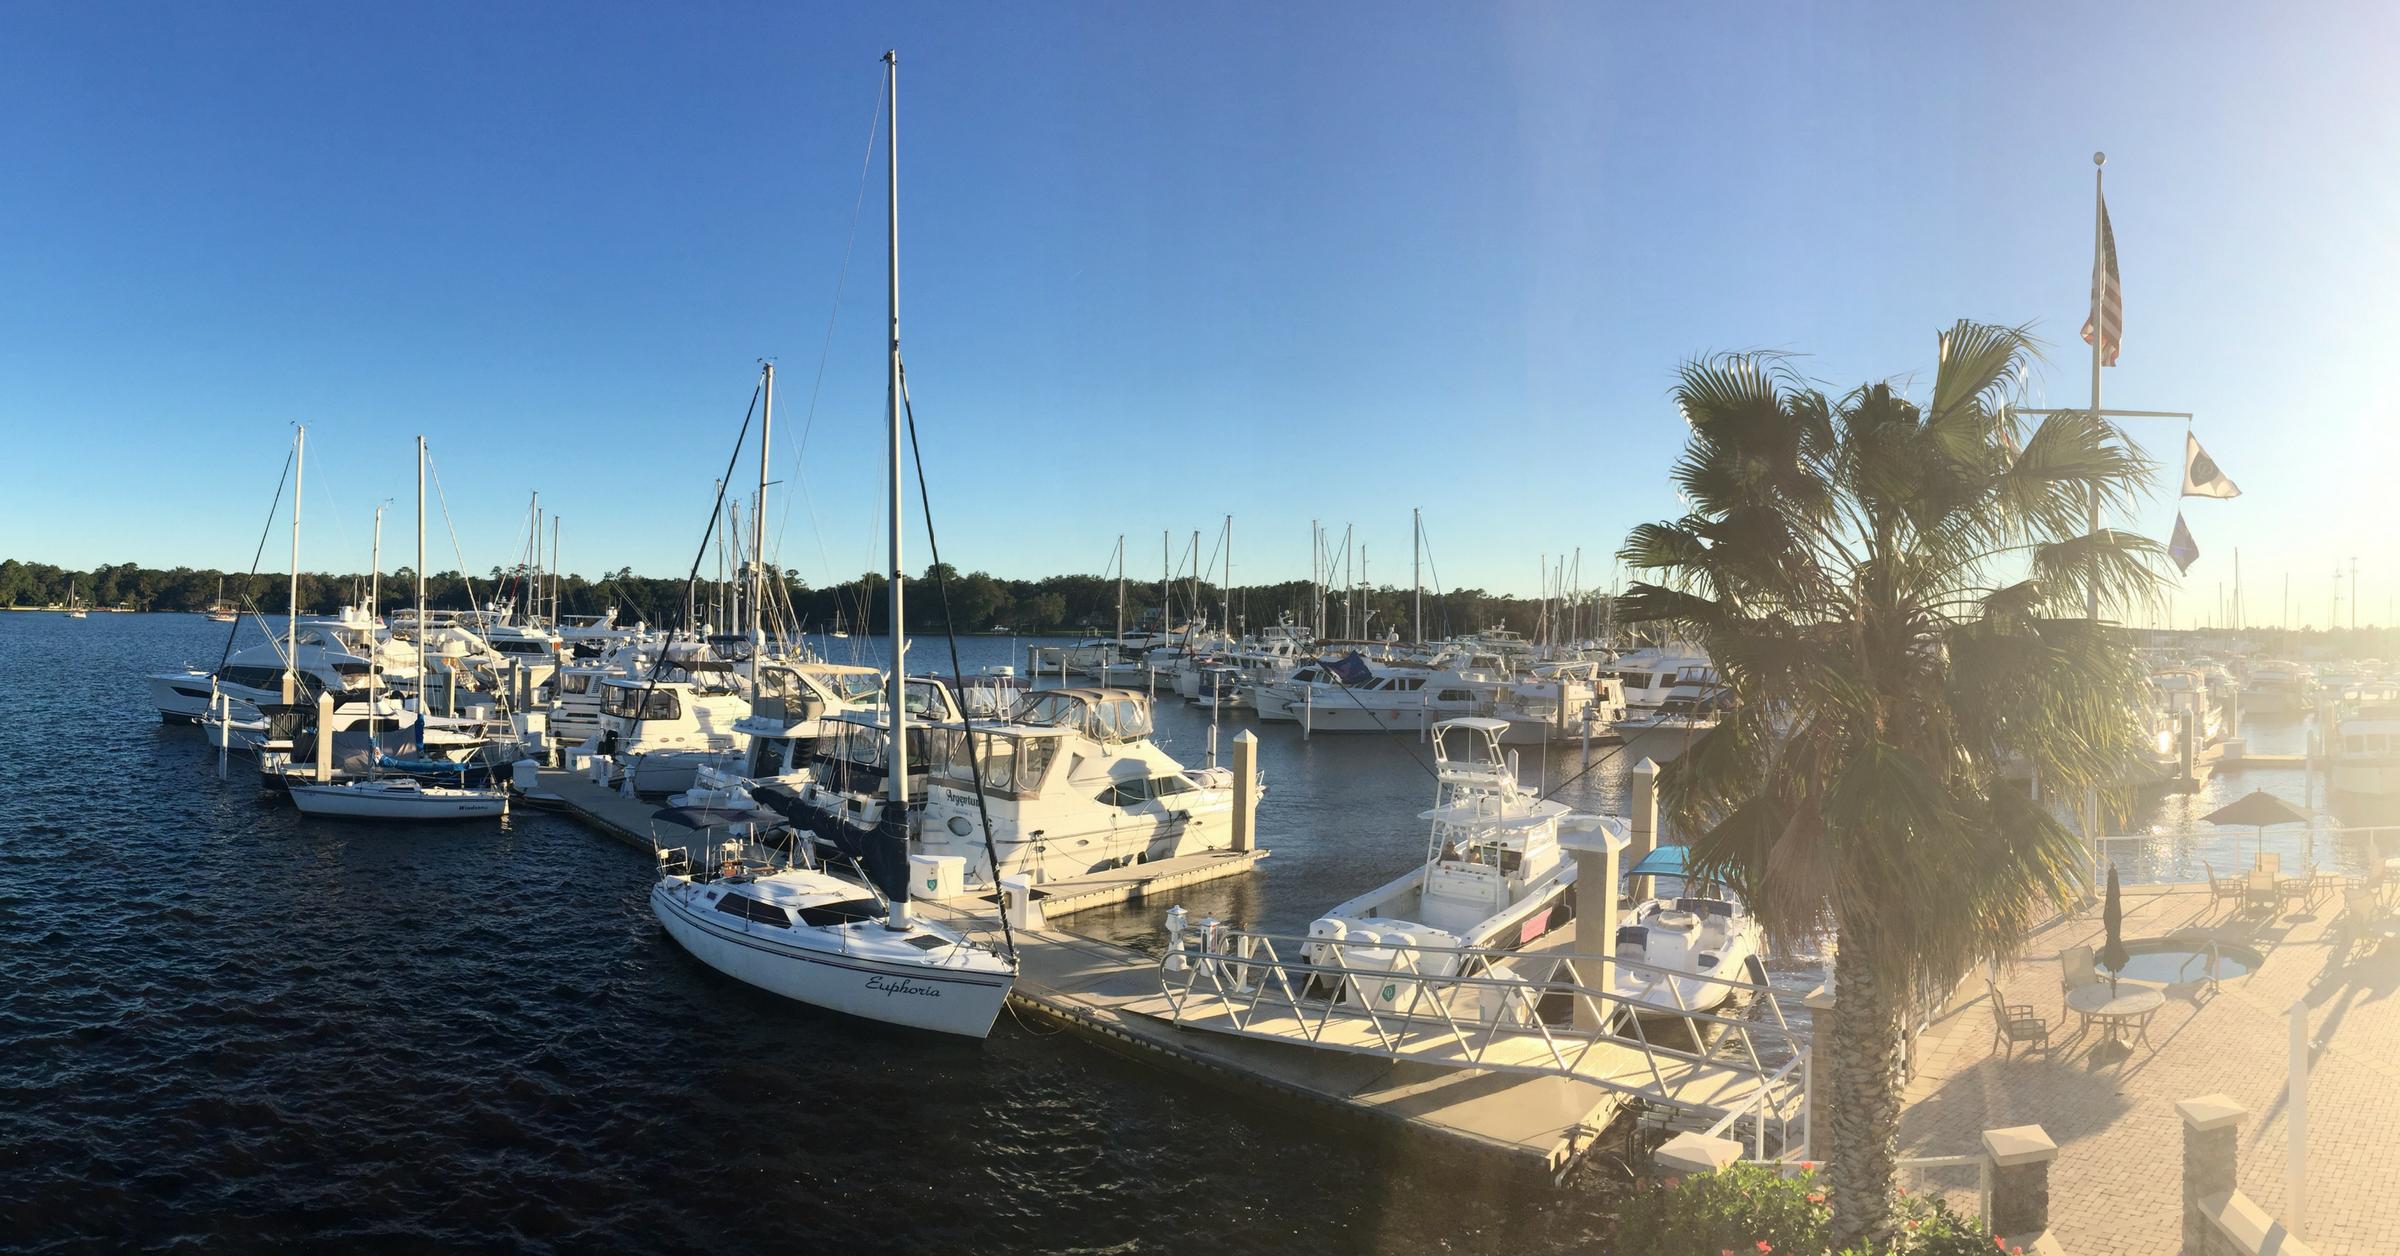 Dockwa Makes Wake: Cruising down the East Coast from Charleston to Palm Beach